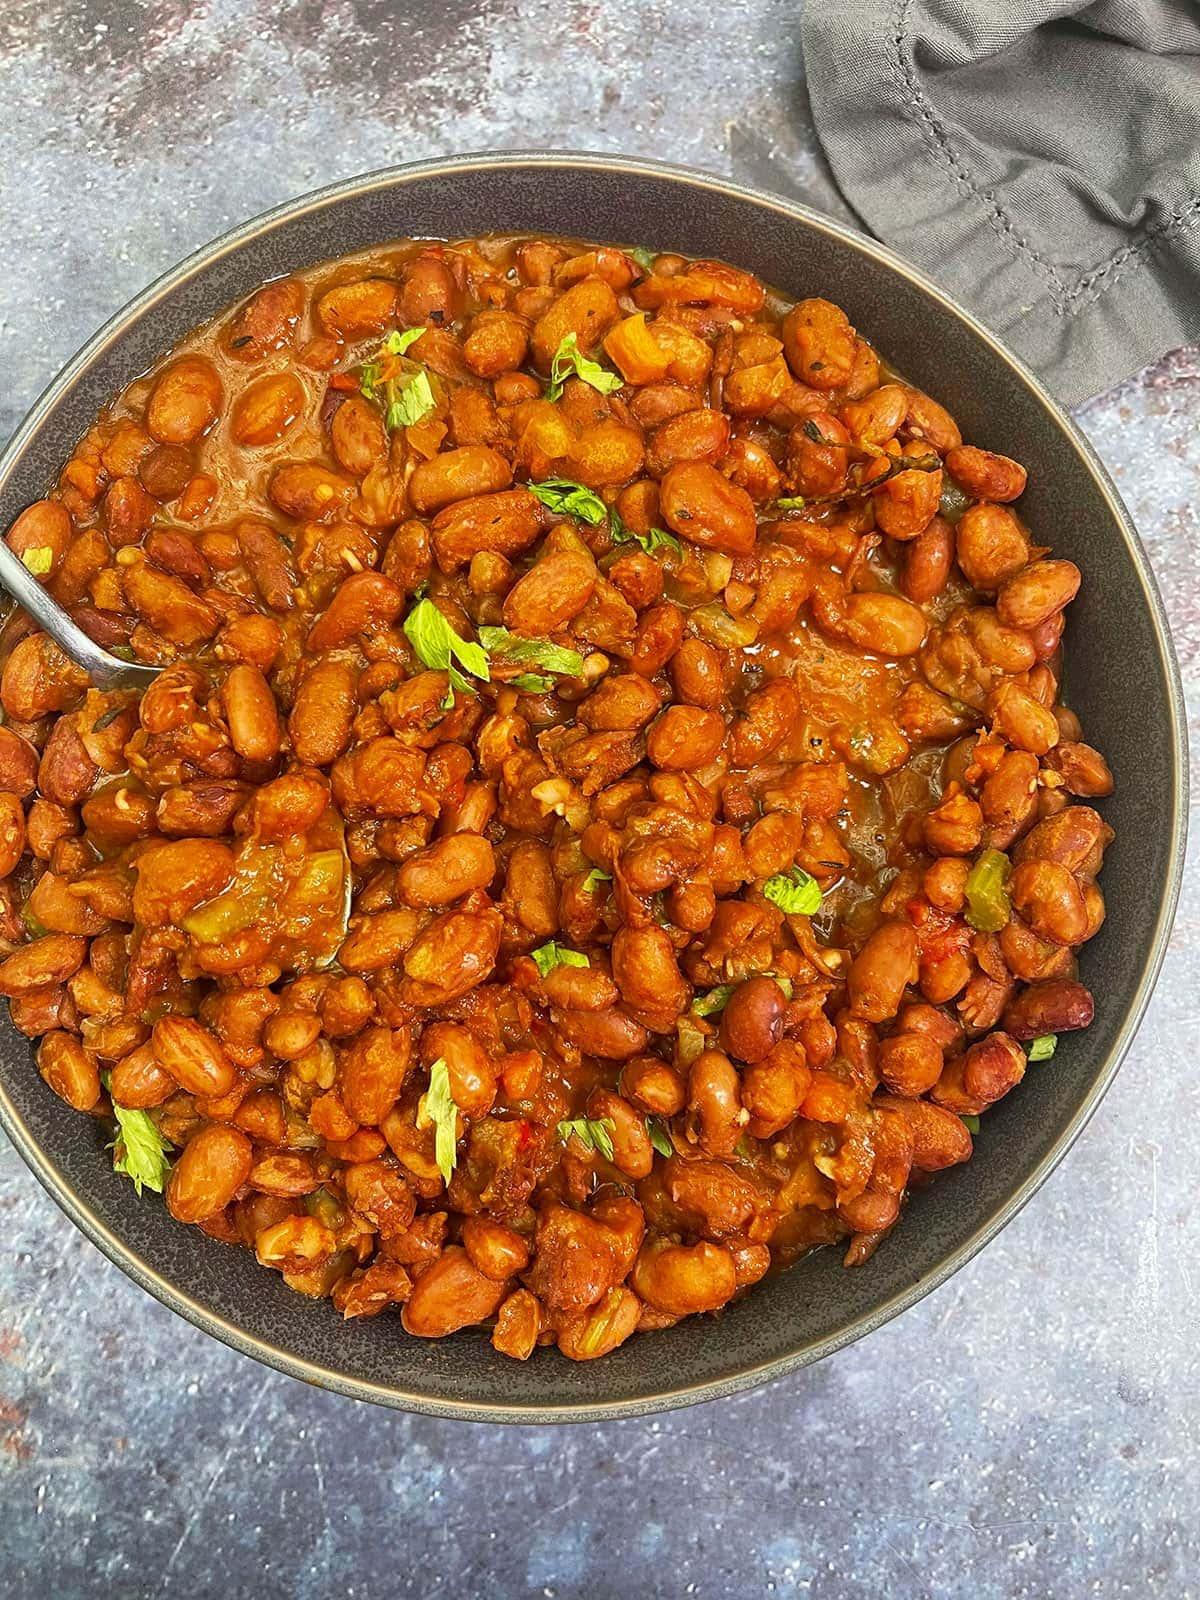 anasazi beans on a blue grey background